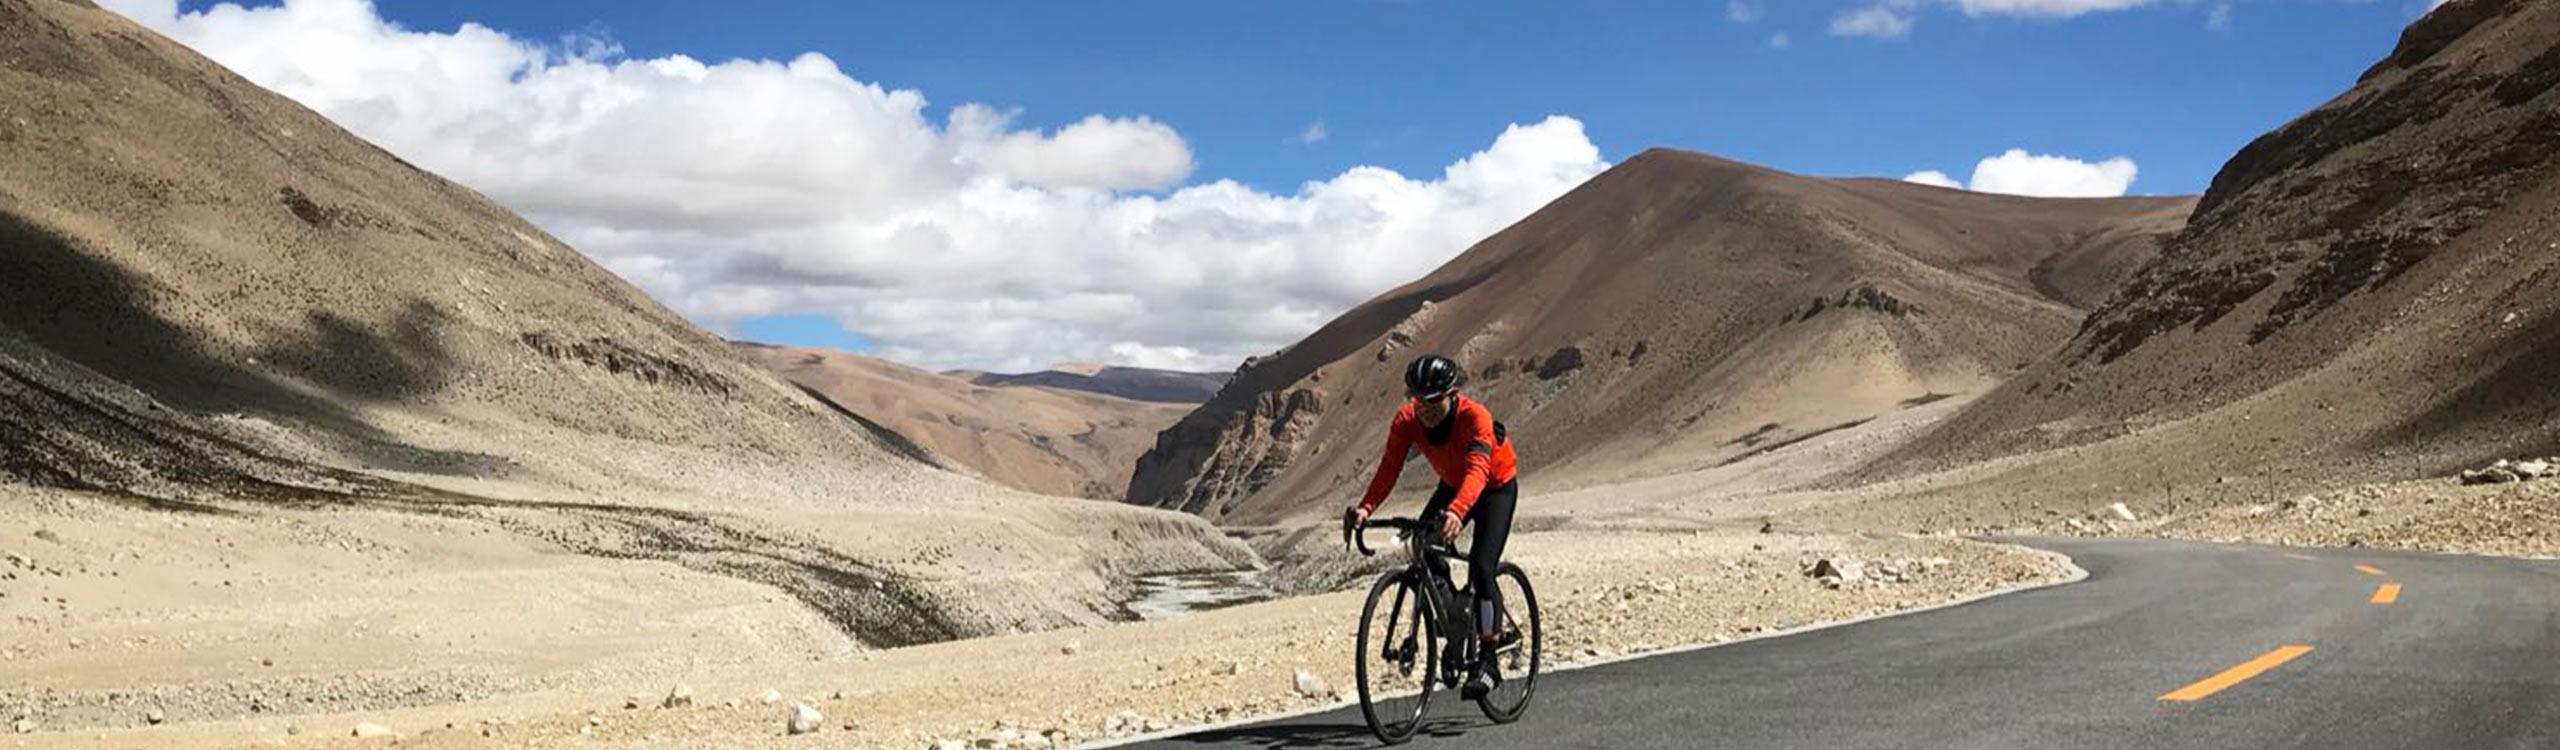 Incredible Tibet Mountain Biking Trip